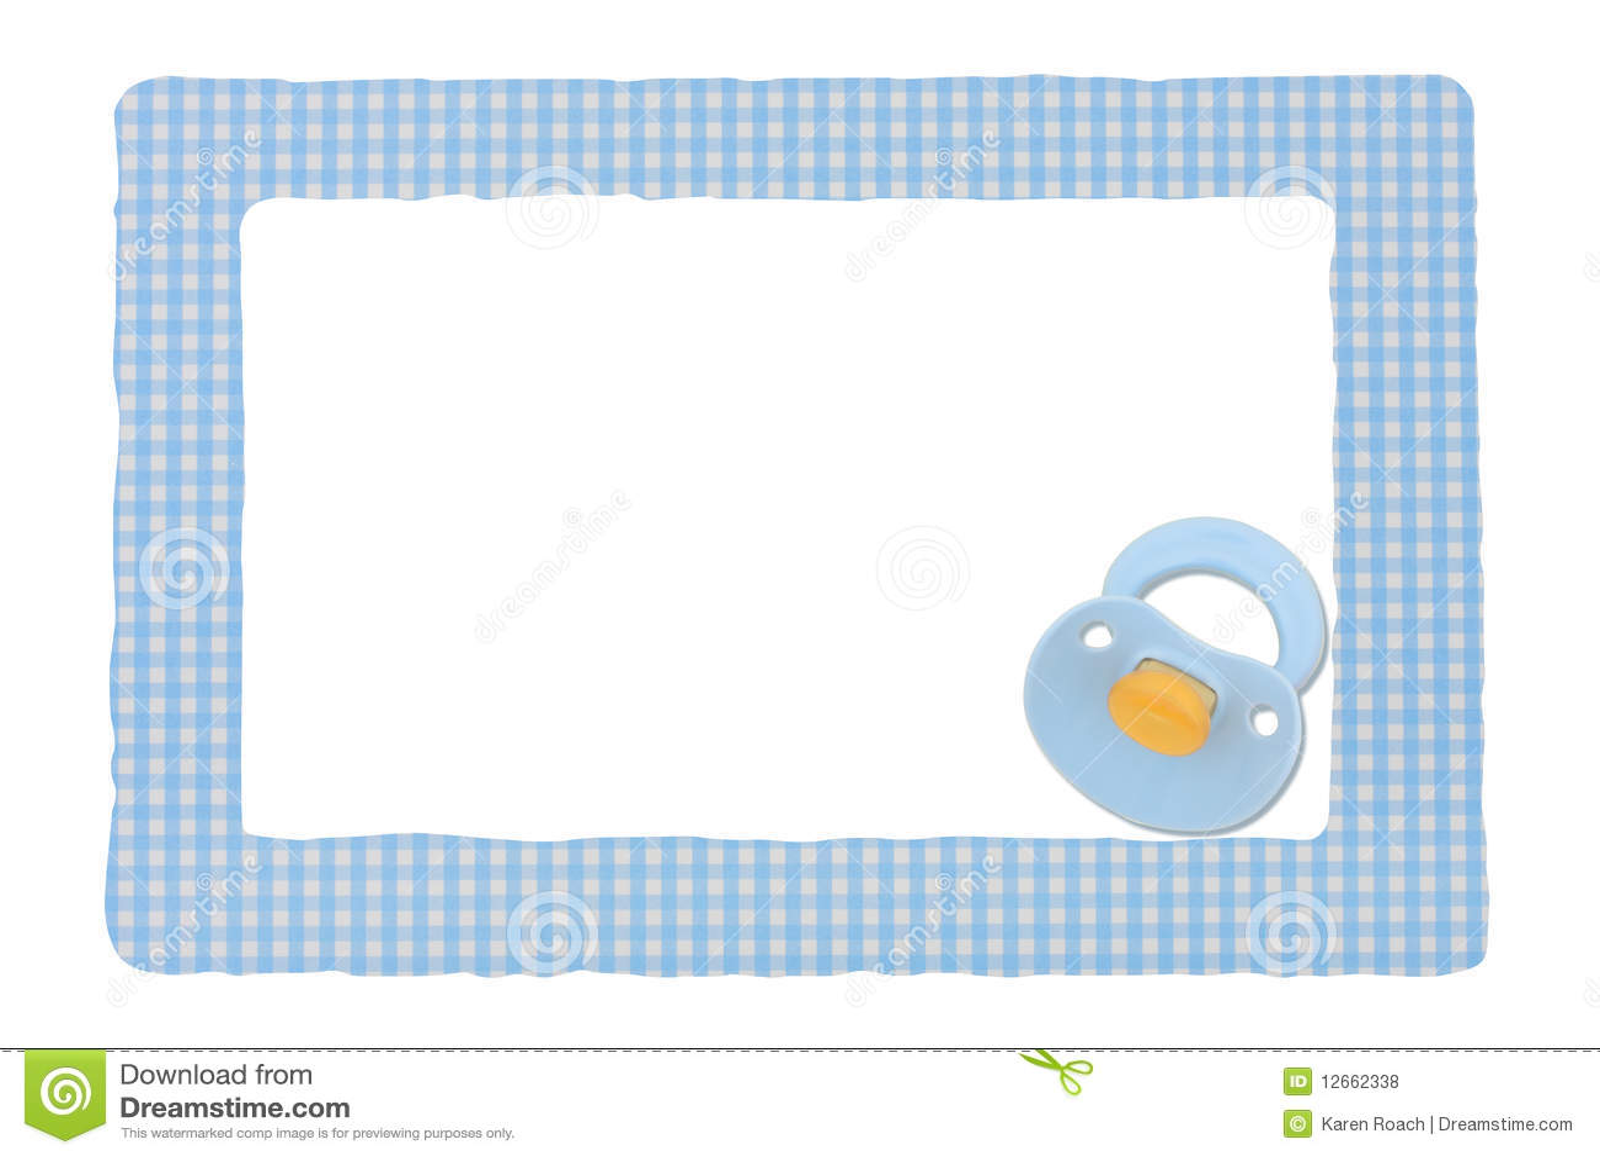 Cute Owl Wallpaper Border Baby Border Royalty Free Stock Photos Image 12662338